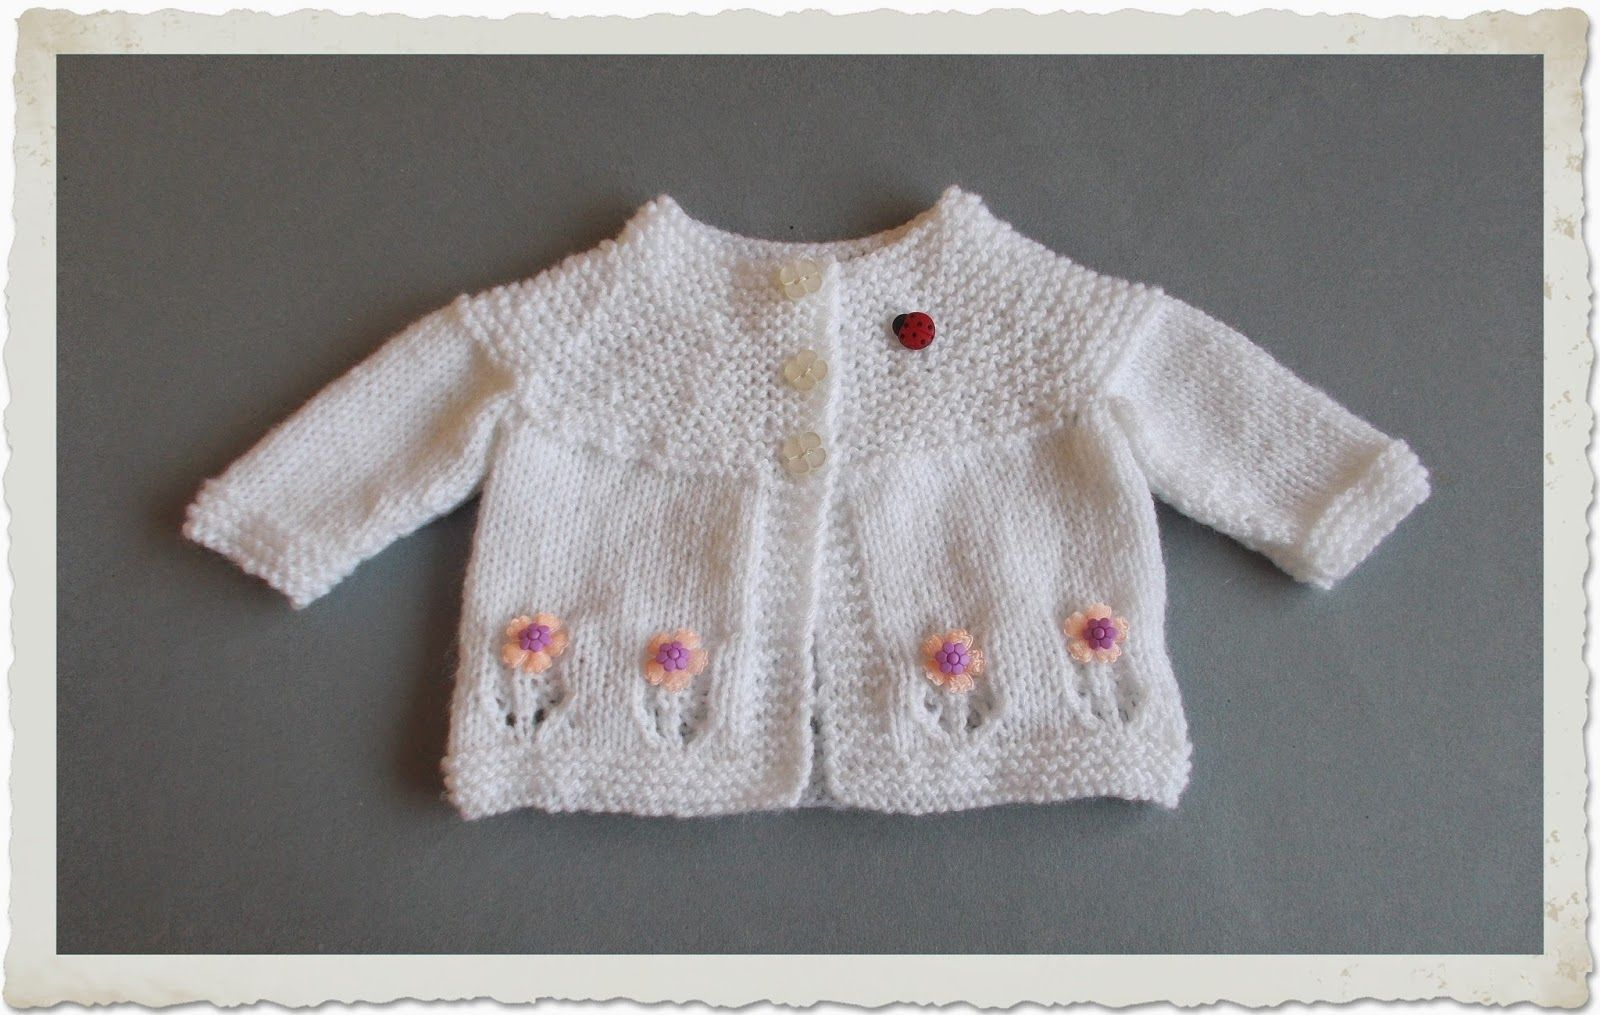 Mariannas lazy daisy days fleur baby cardigan jacket knitting free pattern ravelry fleur baby cardigan jacket pattern by marianna mel bankloansurffo Gallery